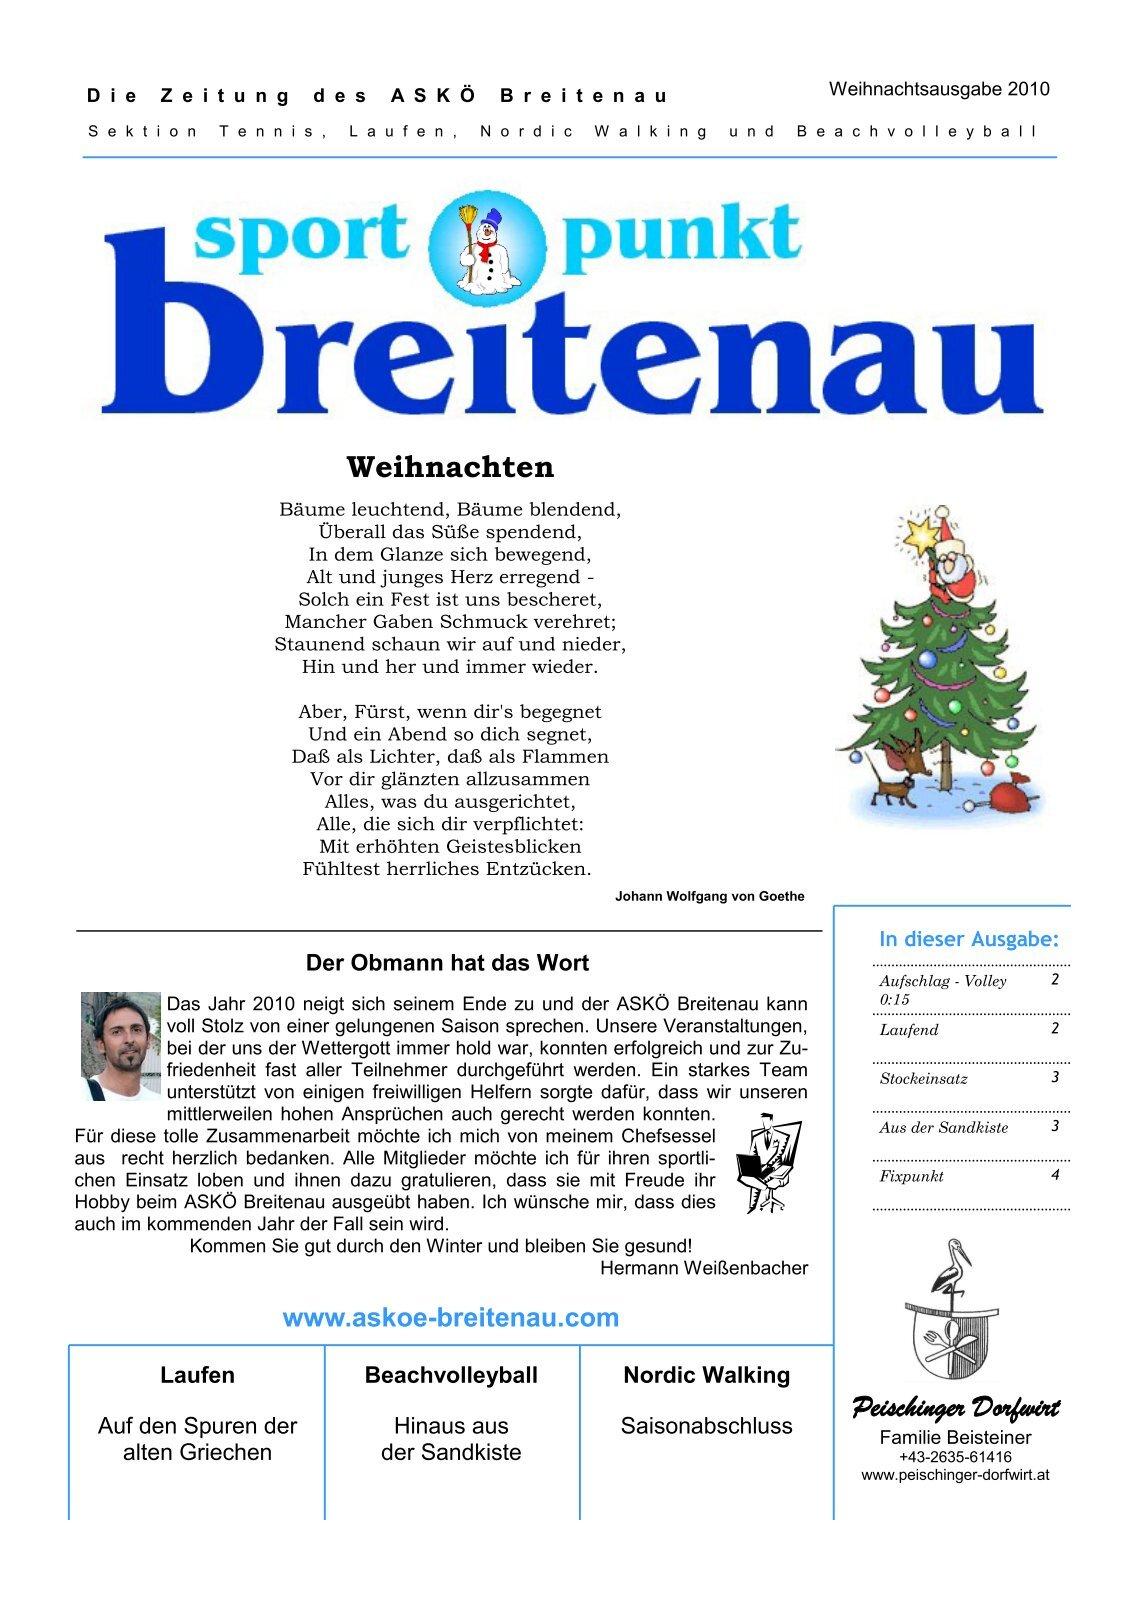 3 Free Magazines From ASKOEBREITENAUCOM